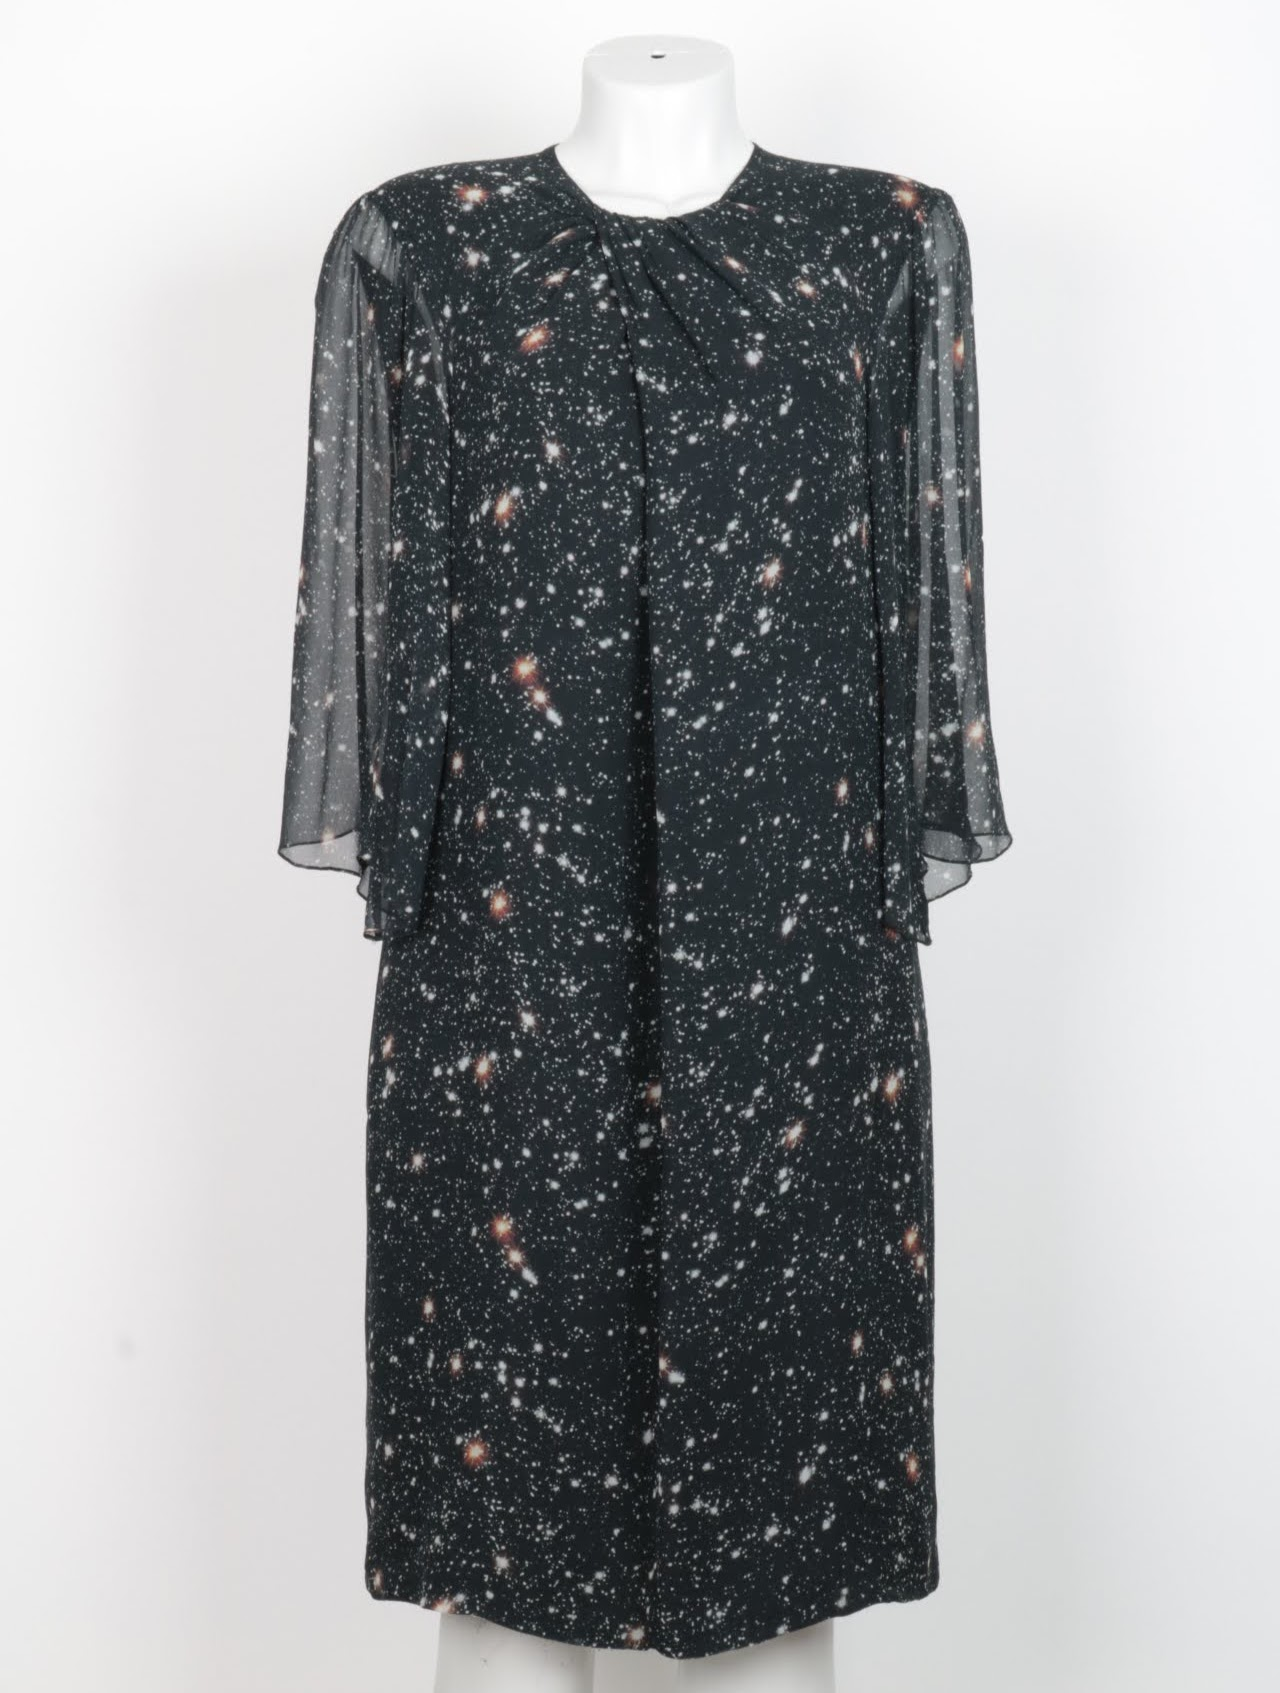 Vestido - Andrea Marques - 44